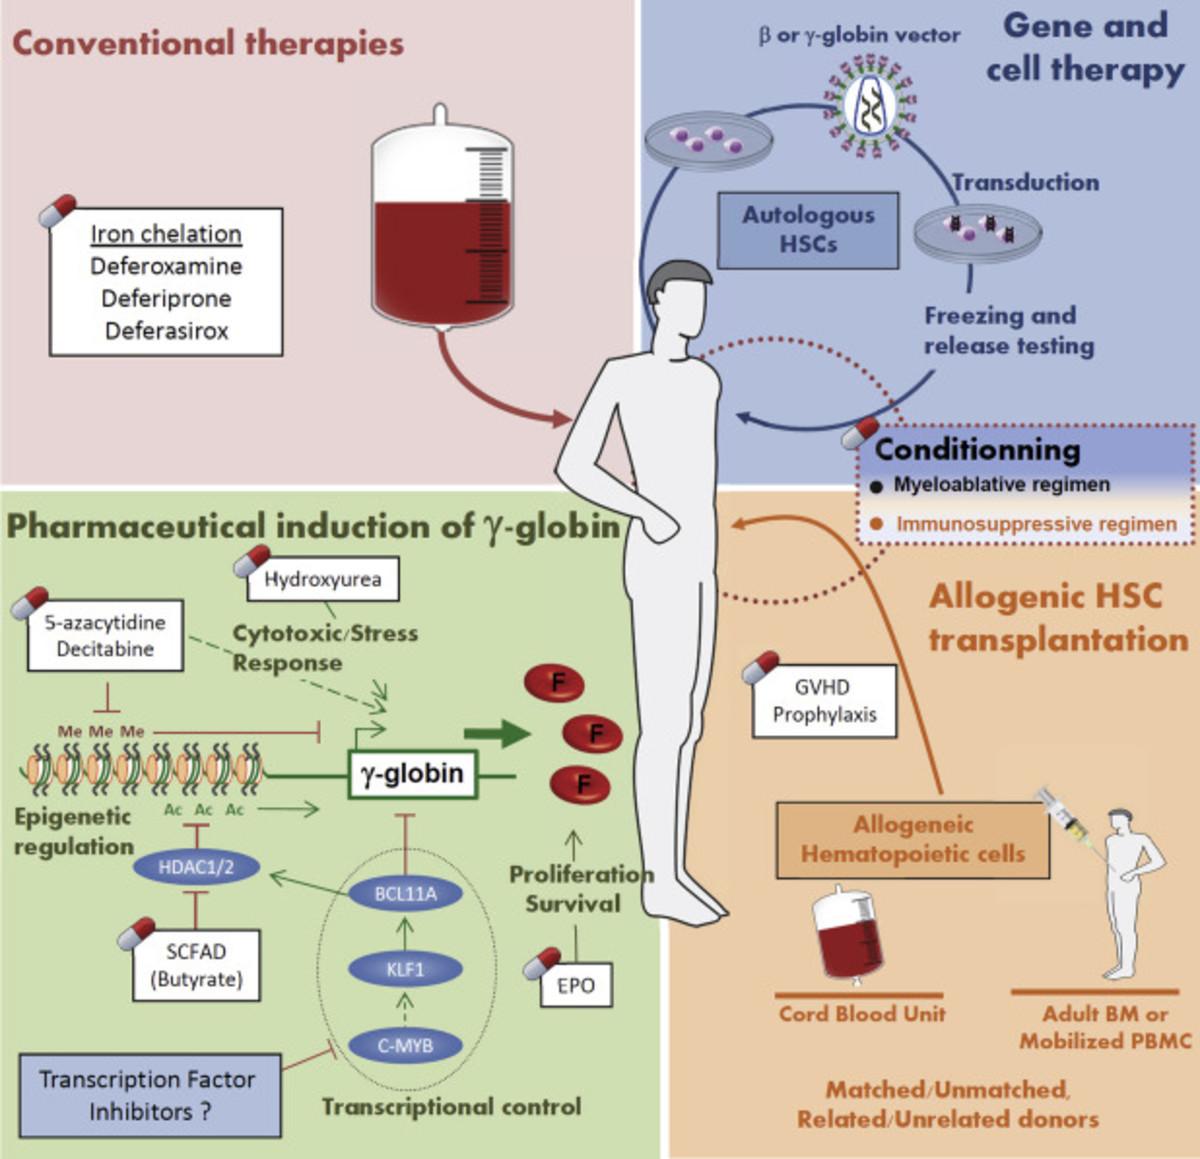 Pic: Some treatment procedures of thalassemia